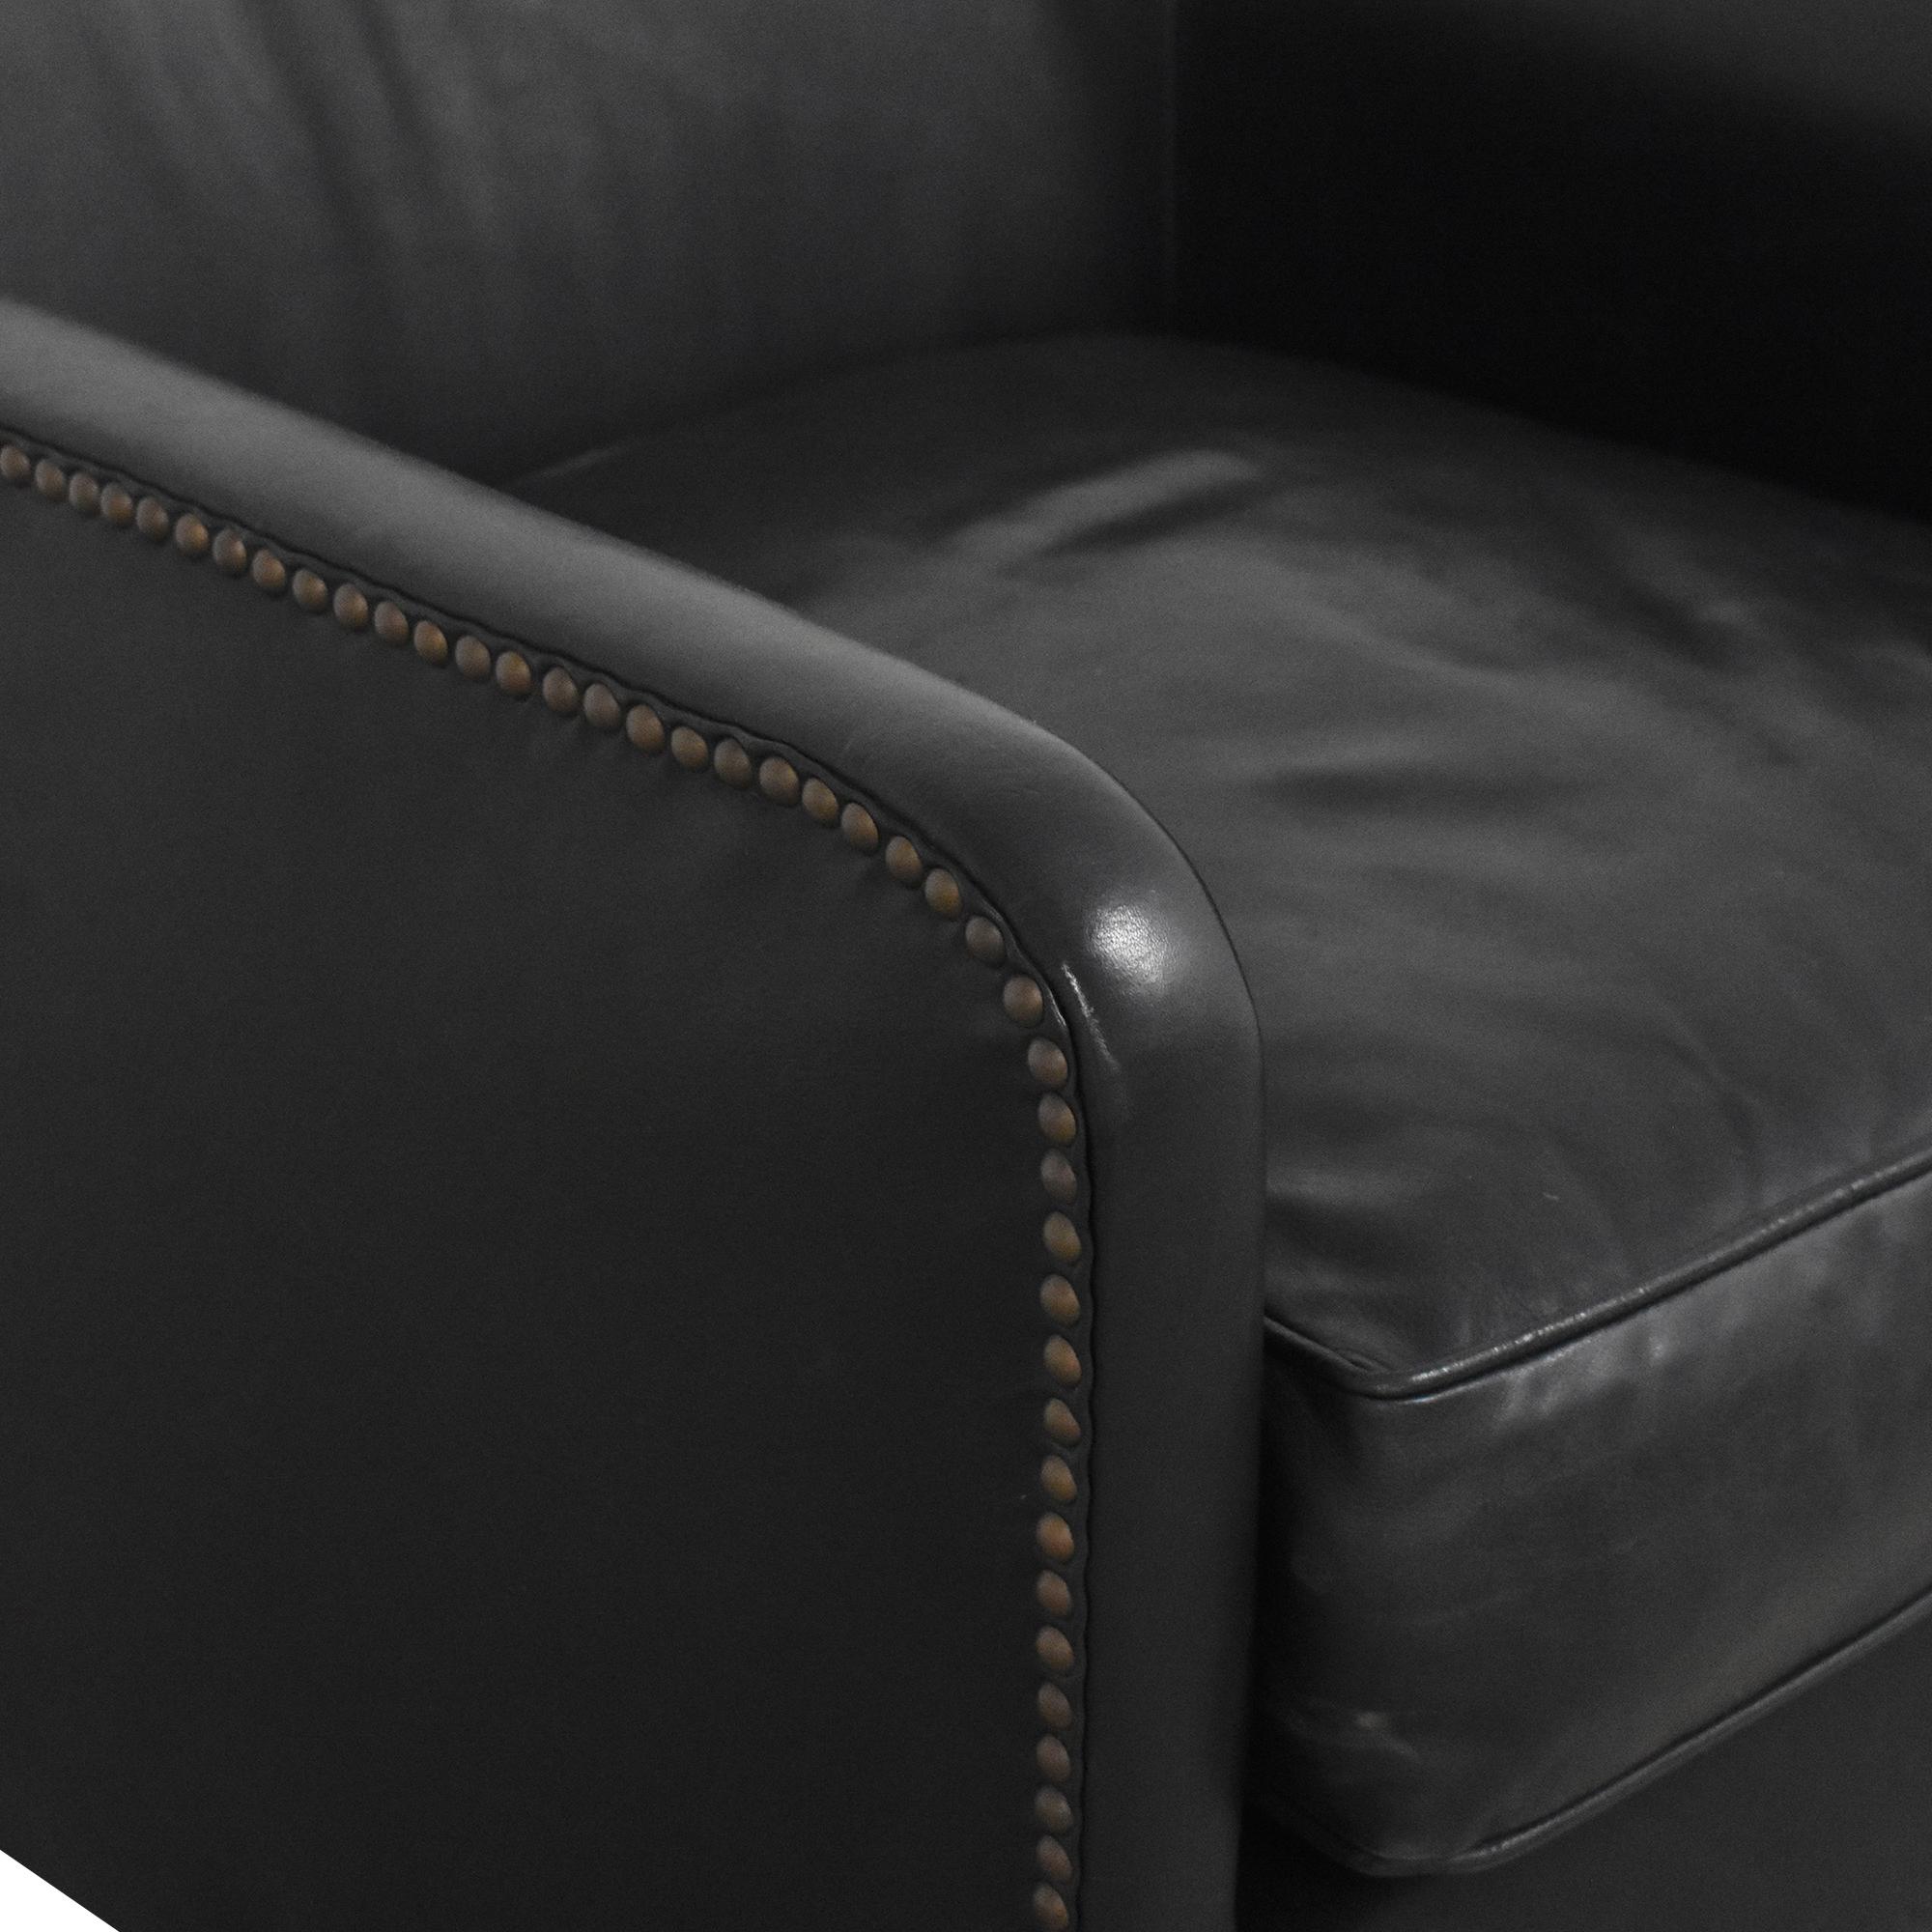 buy Restoration Hardware 1950s French Tuxedo Club Chair Restoration Hardware Chairs